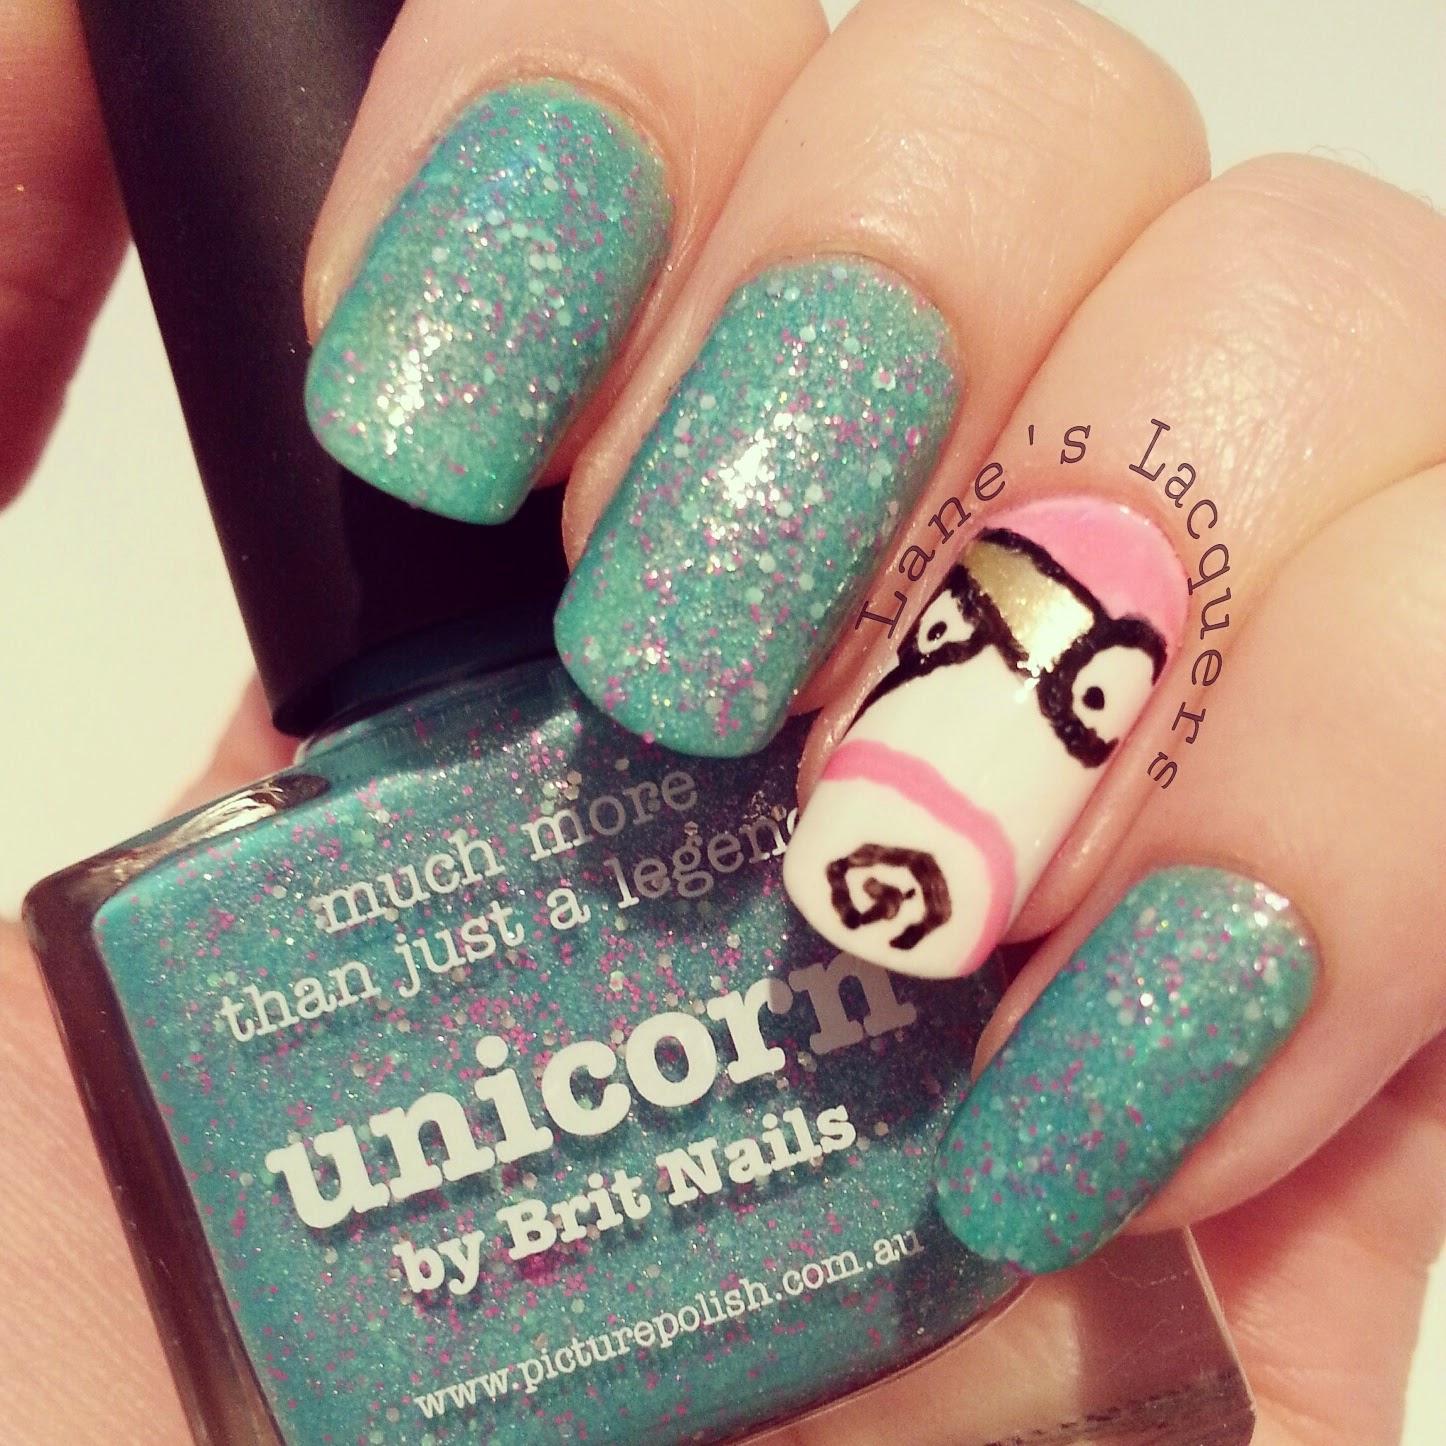 despicable me unicorn nails - photo #18